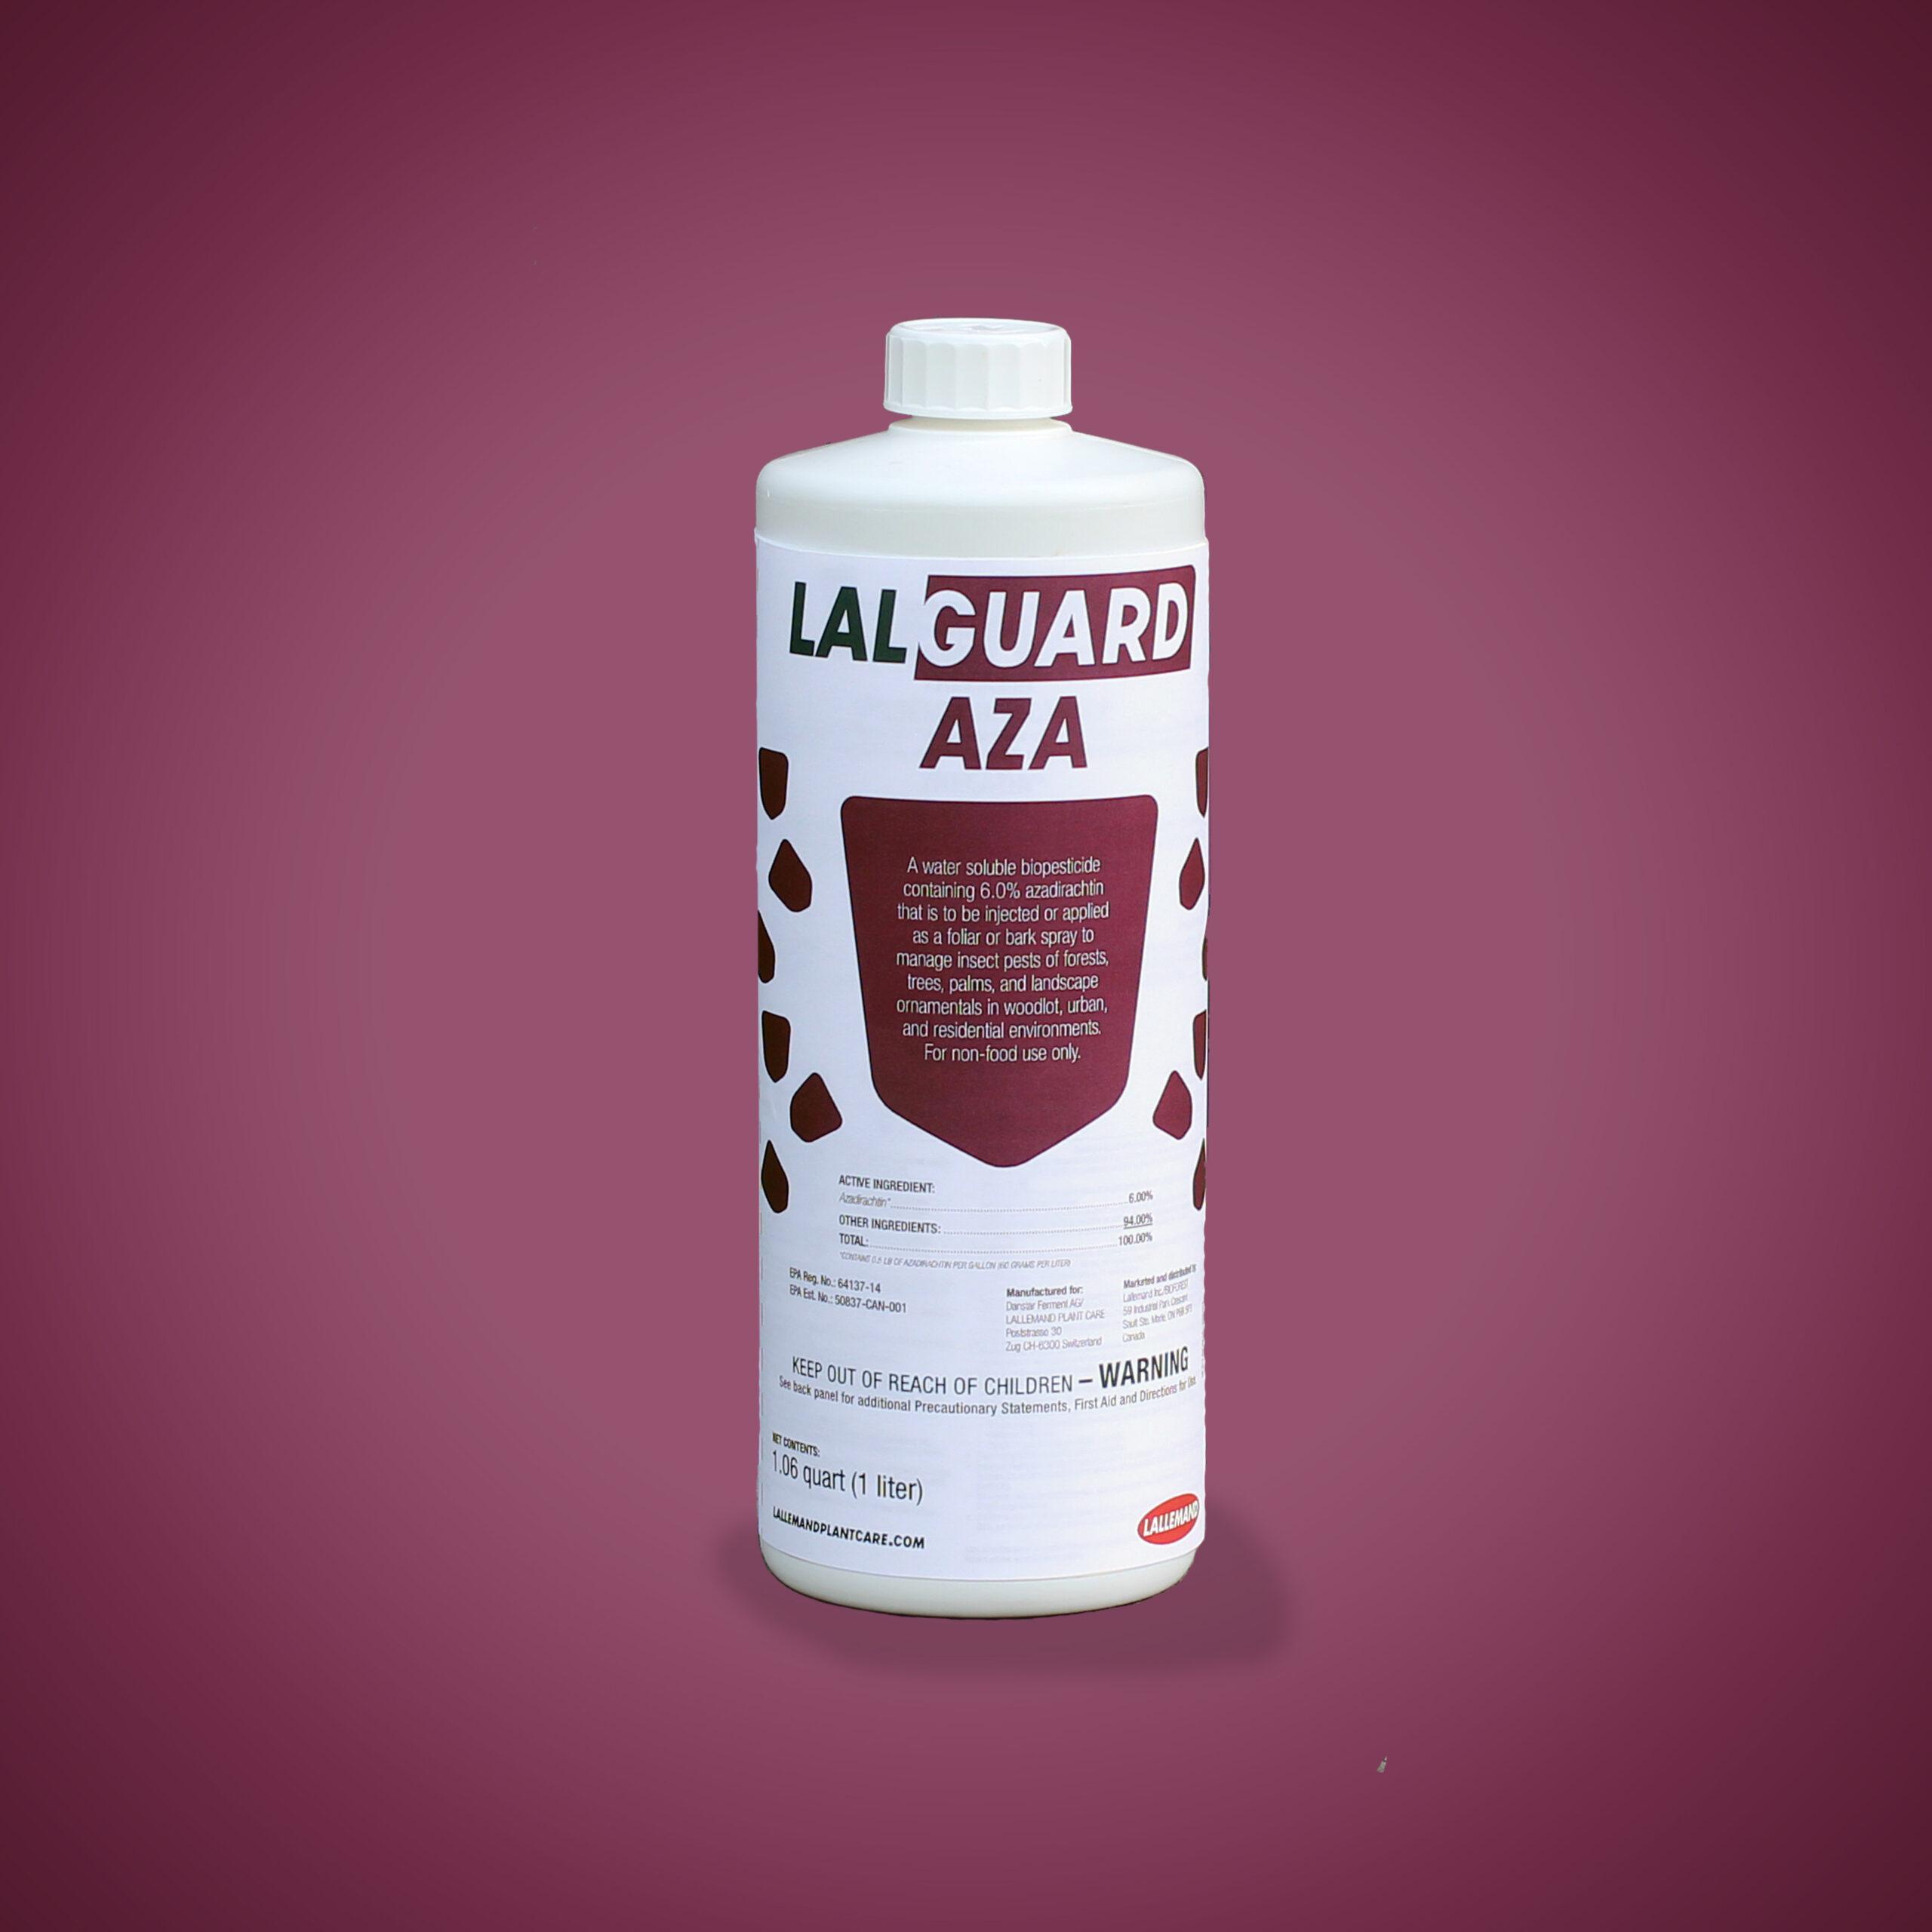 LALGUARD AZA product shot (US)